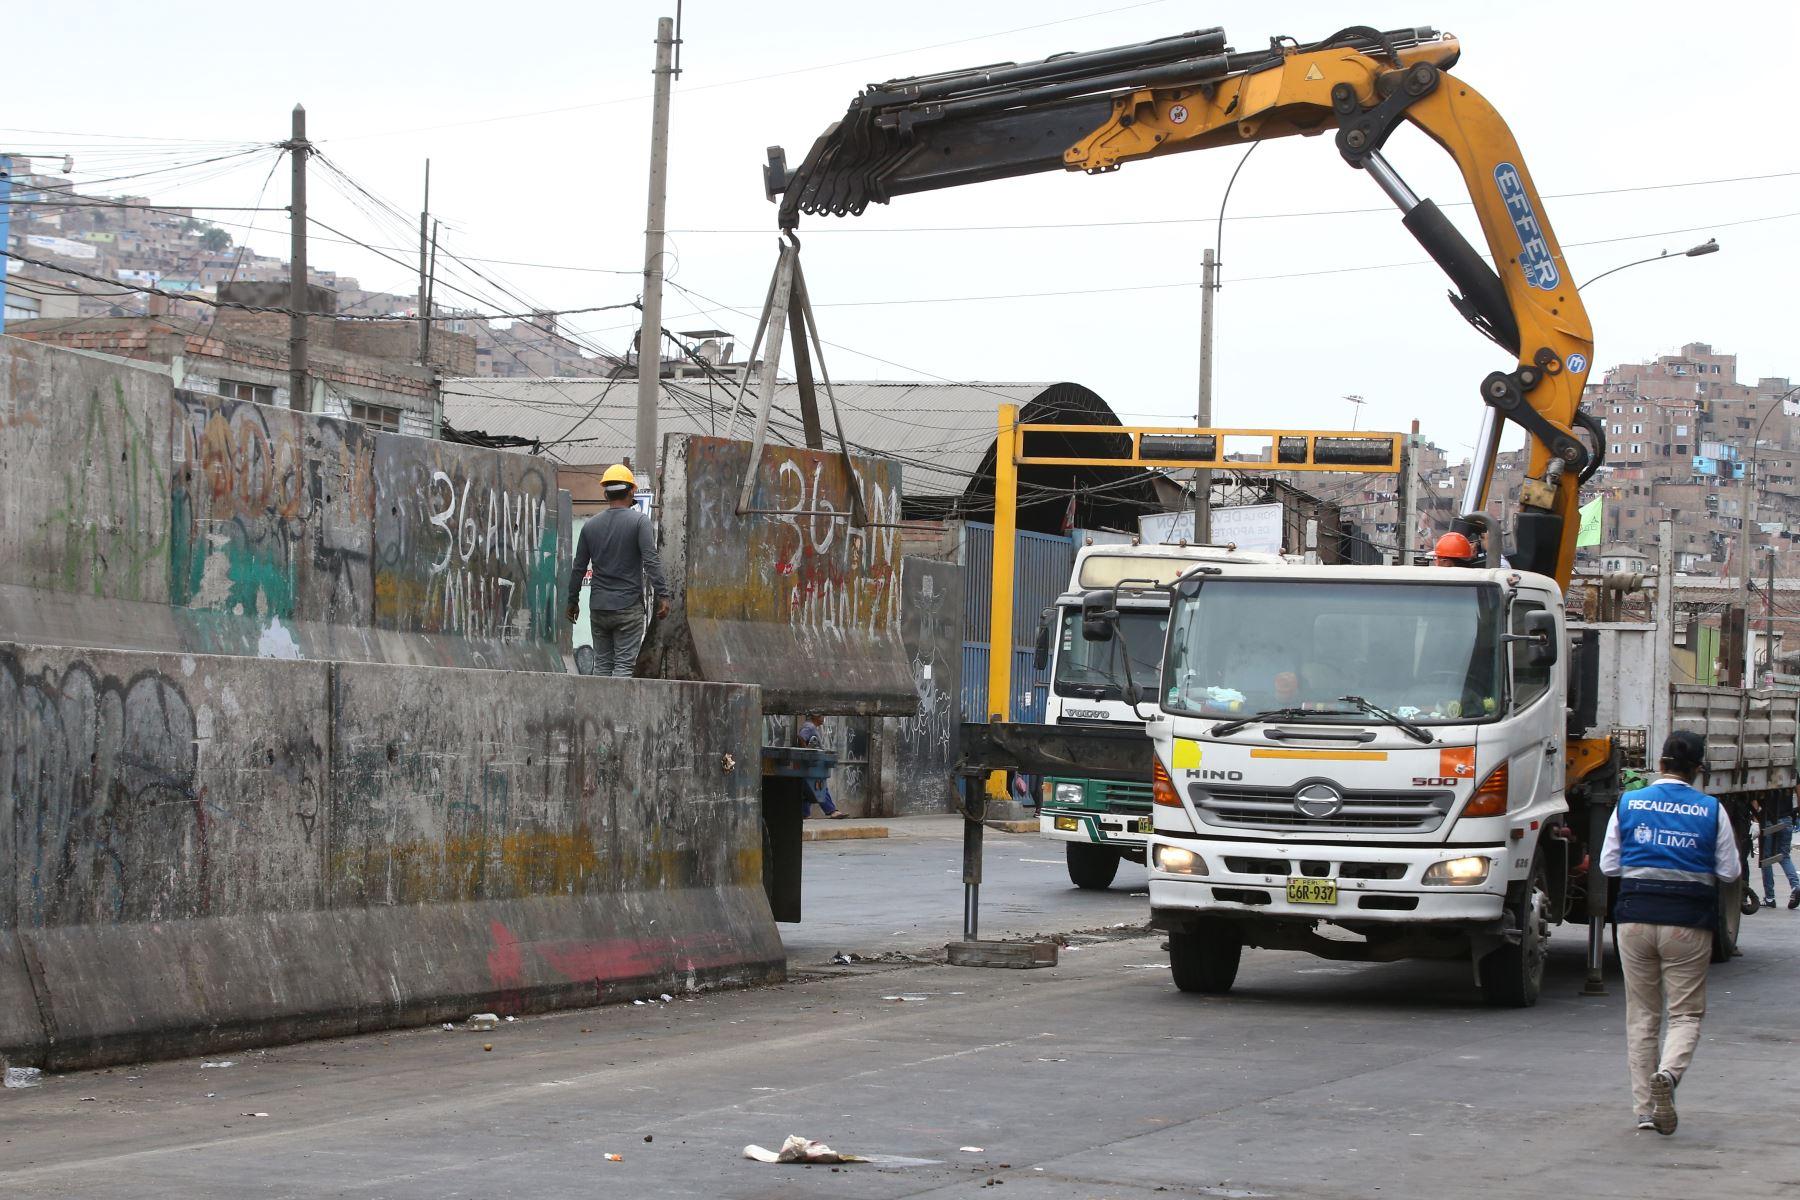 Municipalidad de la Victoria y la PNP realizan Desalojo en la Av. Necolas Ayllon. Foto: ANDINA/Vidal Tarqui